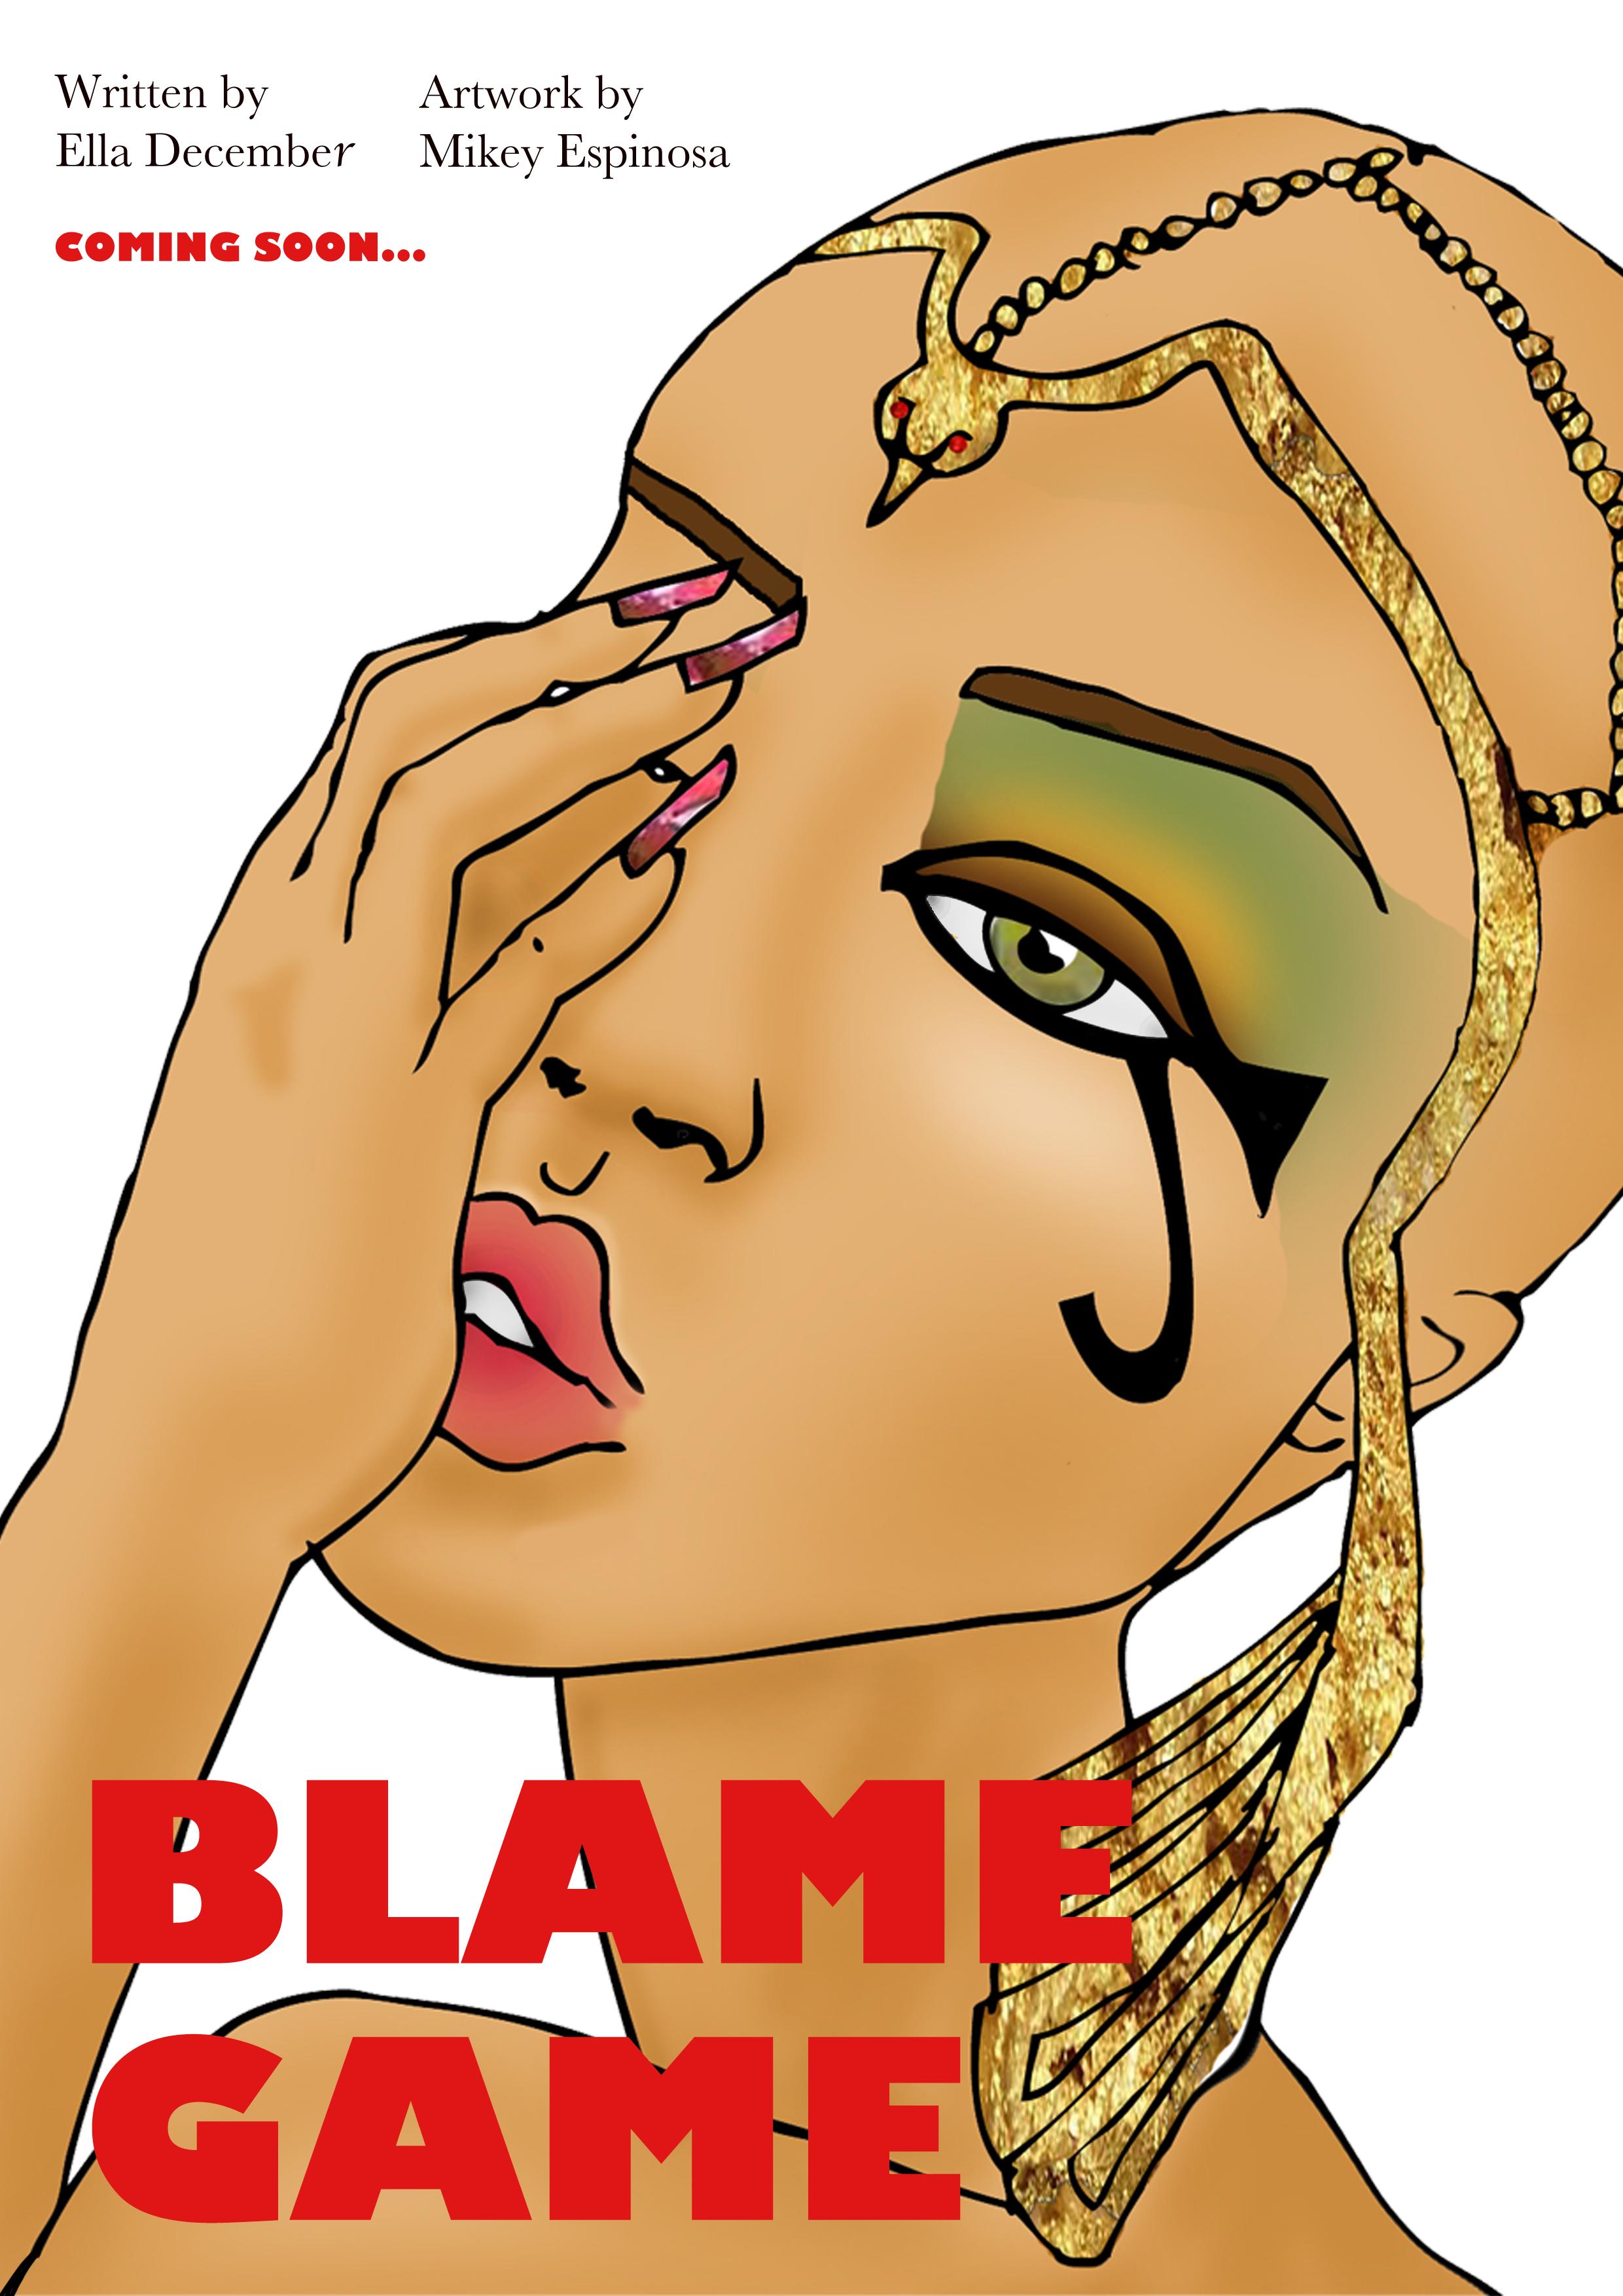 Blame Game - Blame Game